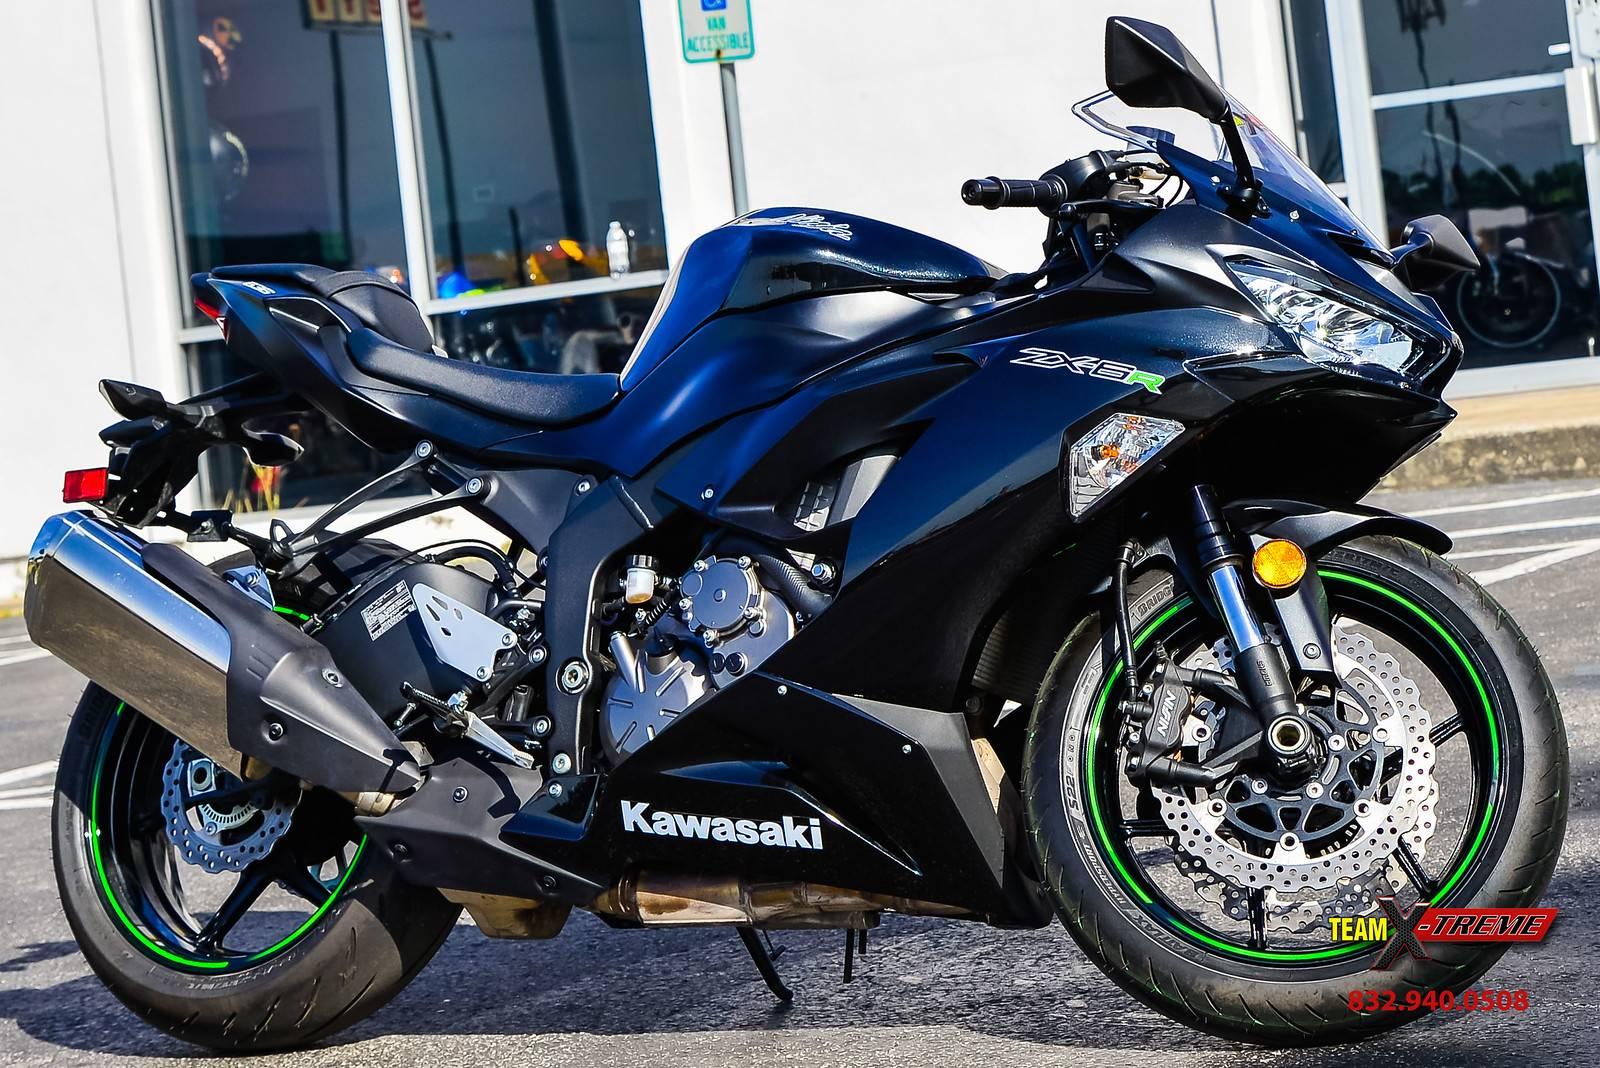 Used 2019 Kawasaki Ninja Zx 6r Motorcycles In Houston Tx Stock